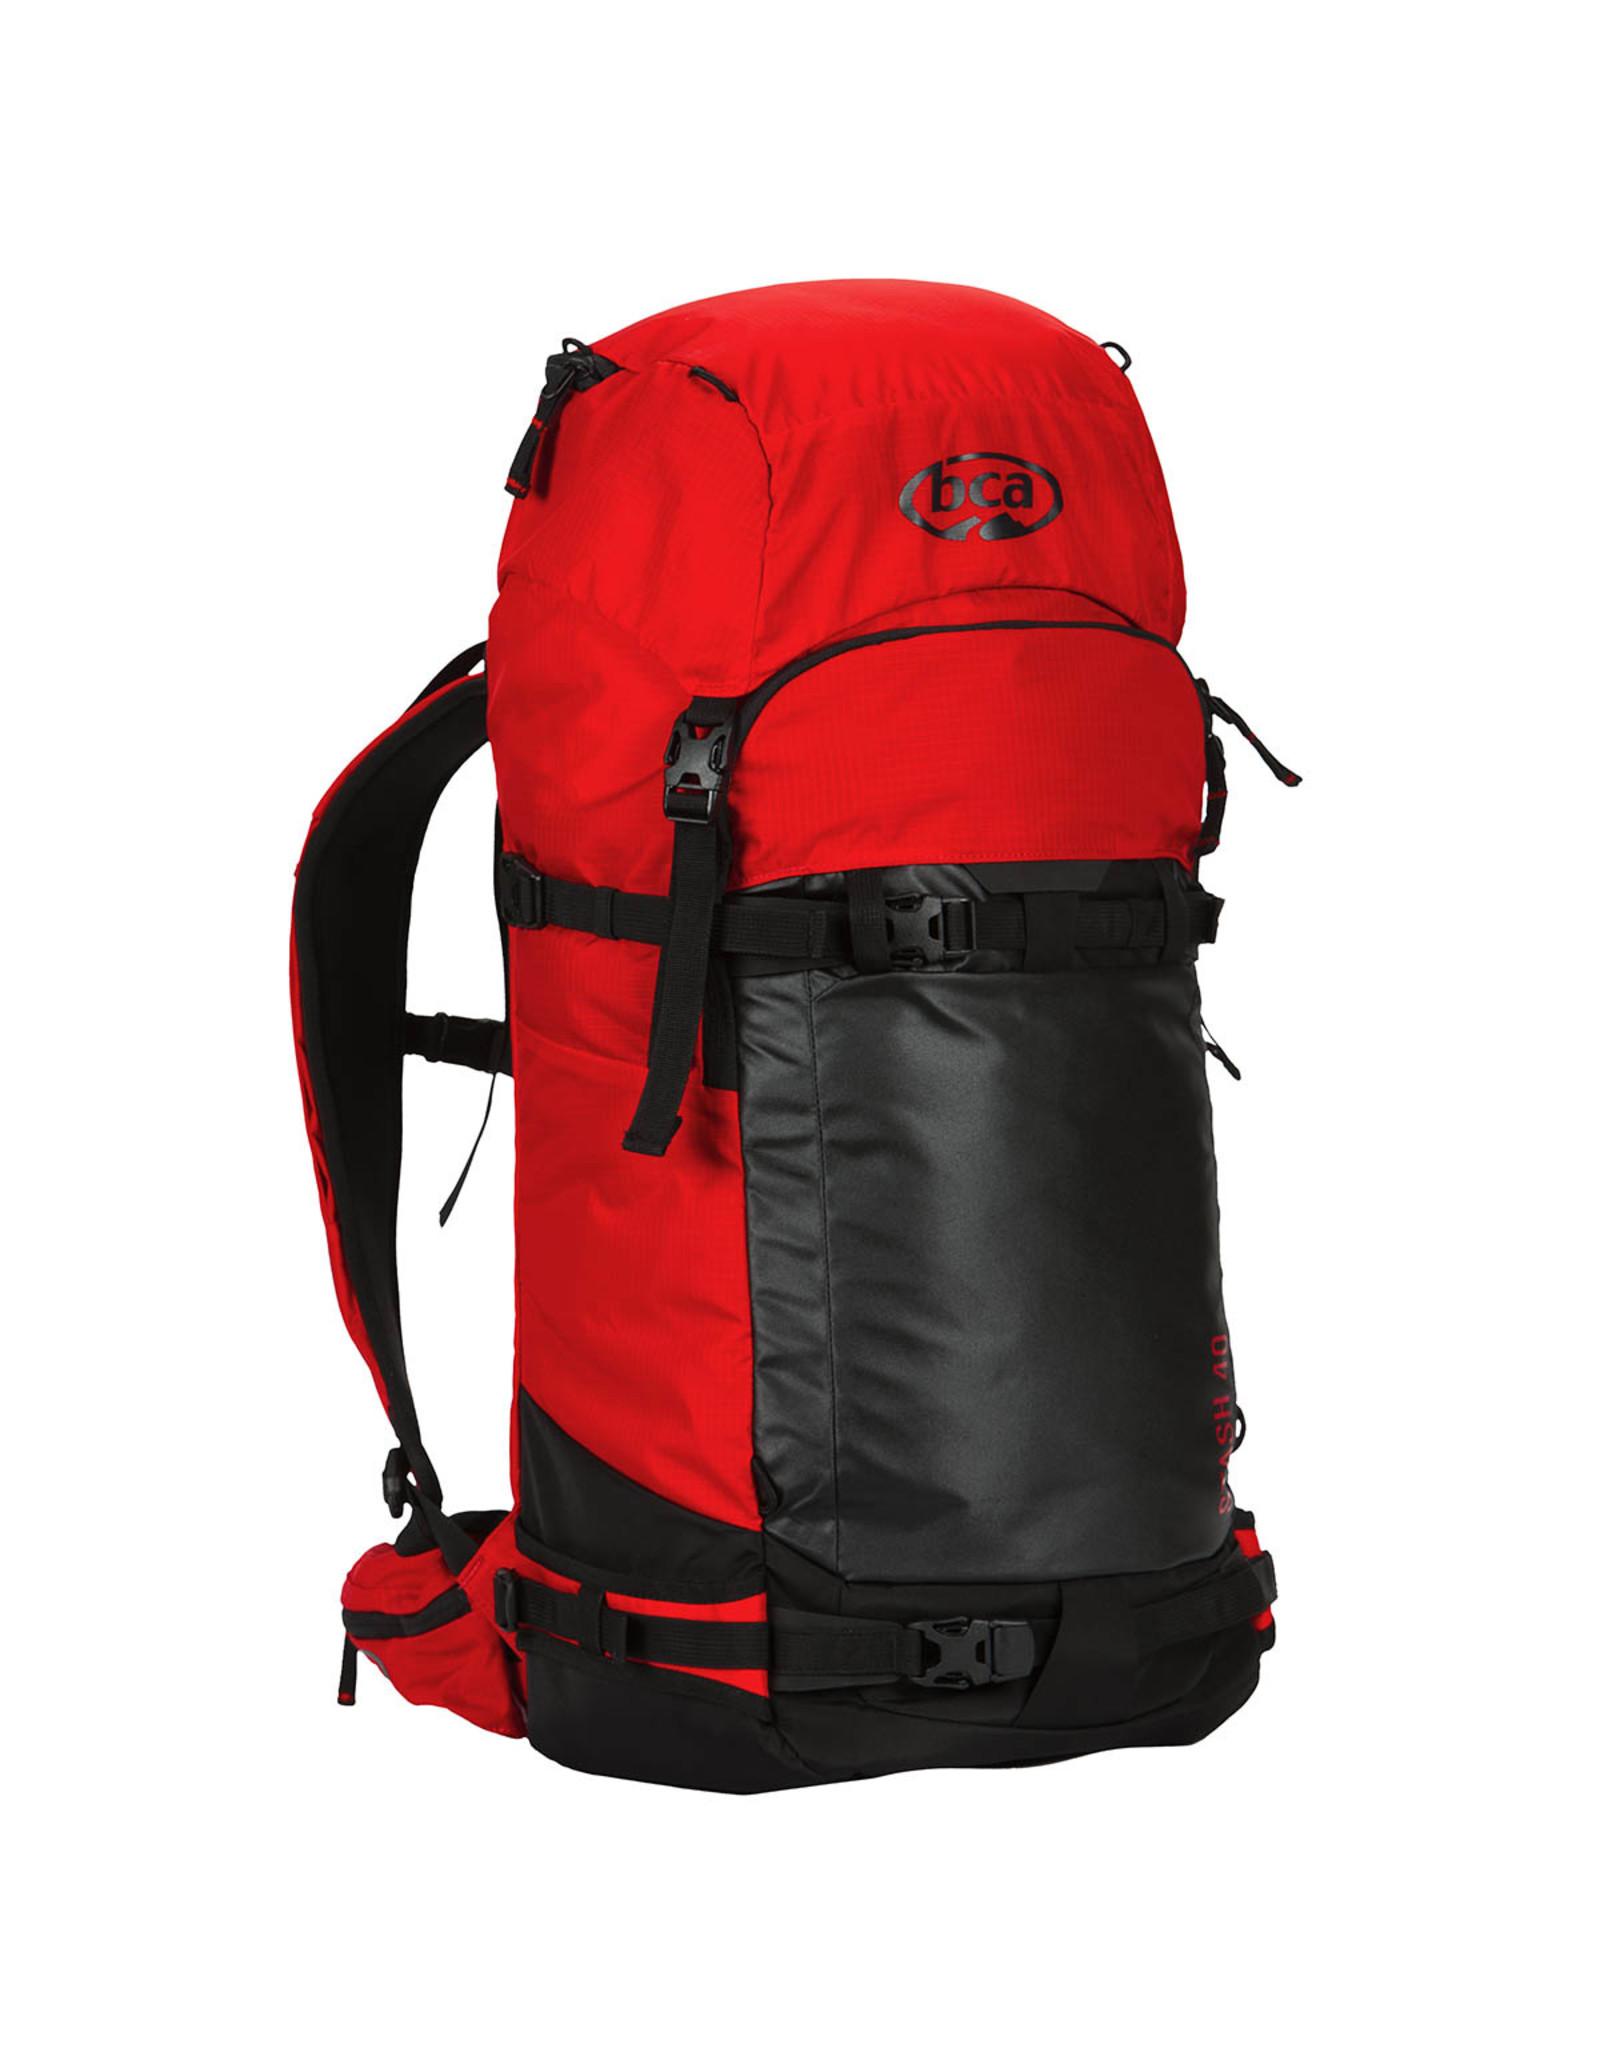 Backcountry Access BCA Stash 40 Ski Pack